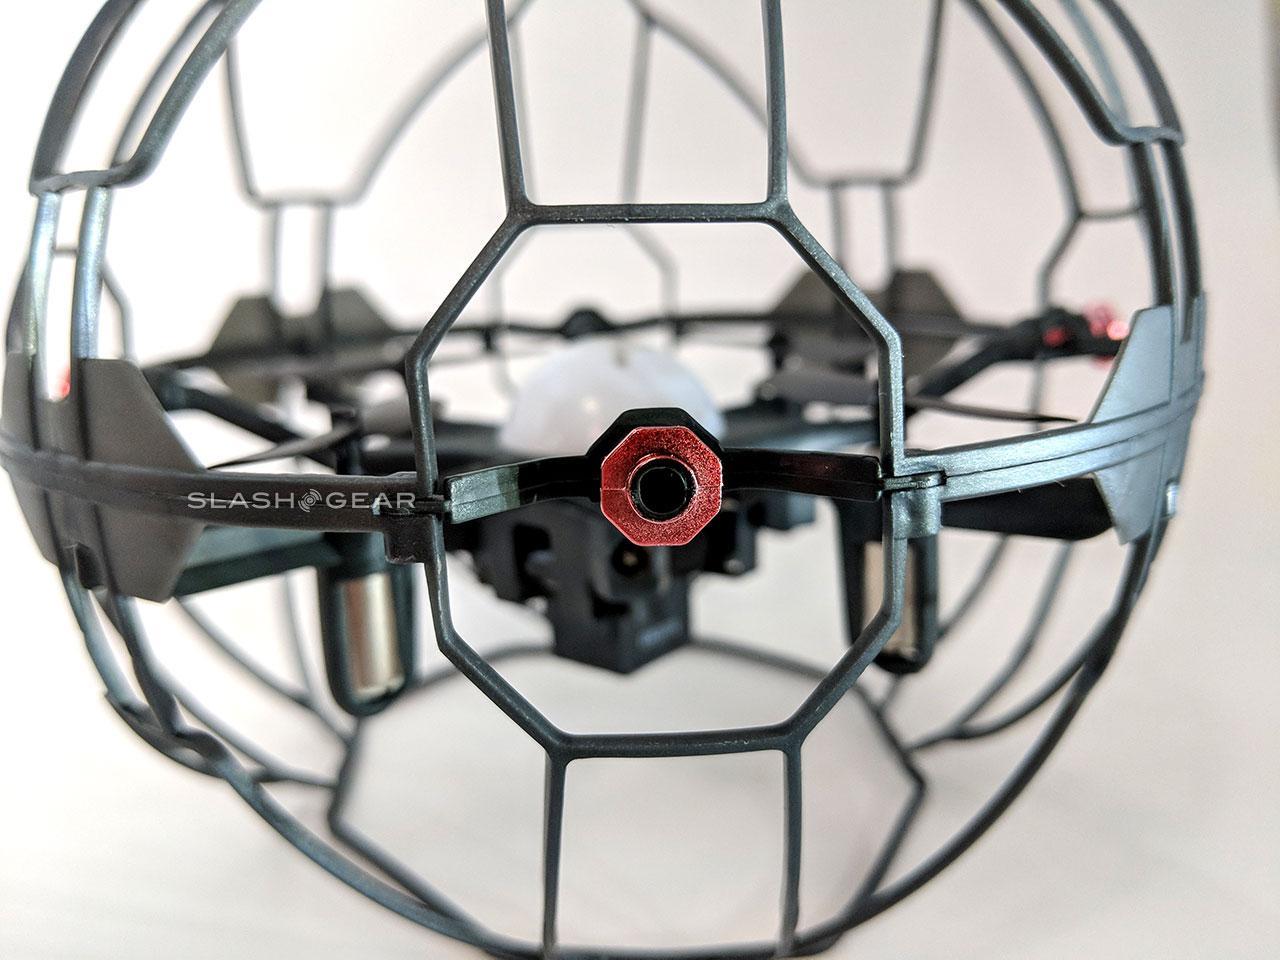 b522cb7d81c61 Air Hogs Supernova Review  Simple drone with motion control - SlashGear